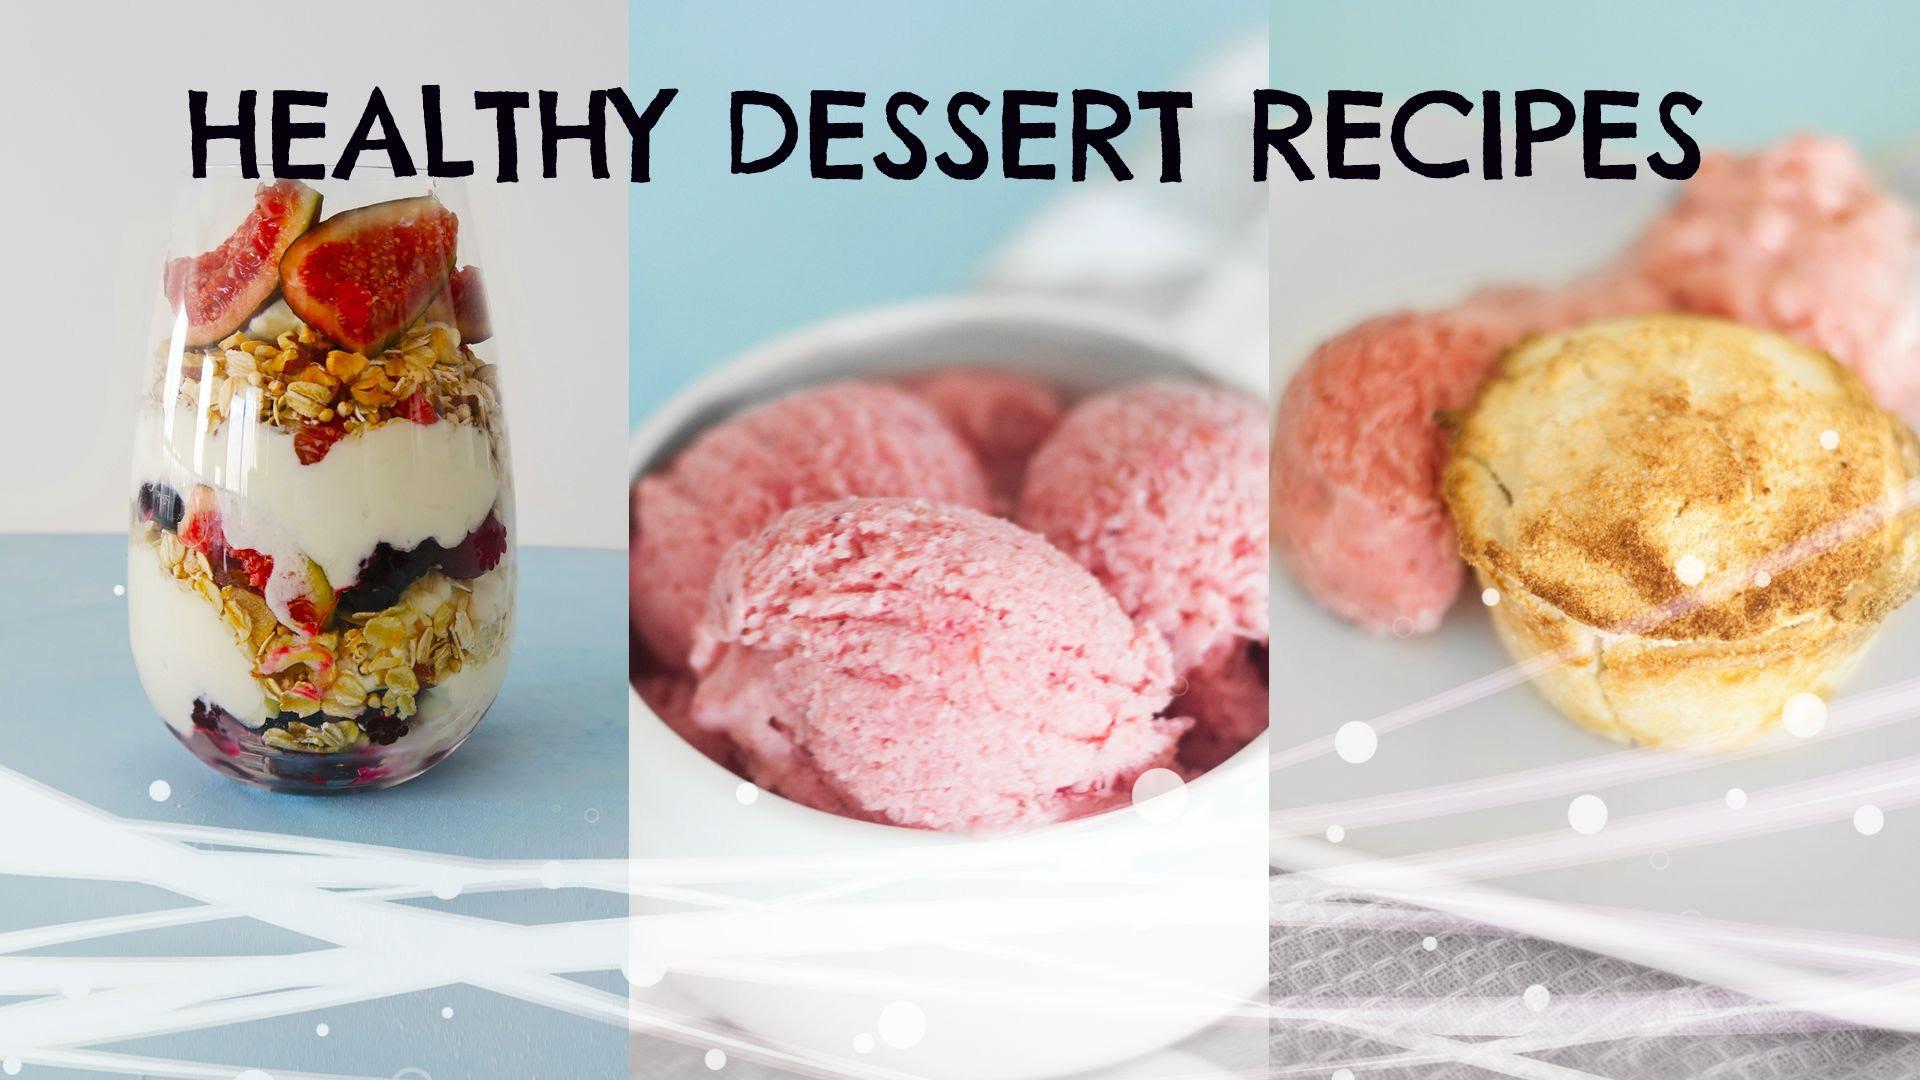 Easy Healthy Dessert Recipe  Healthy DESSERT Recipes simple sweets Rachel Aust